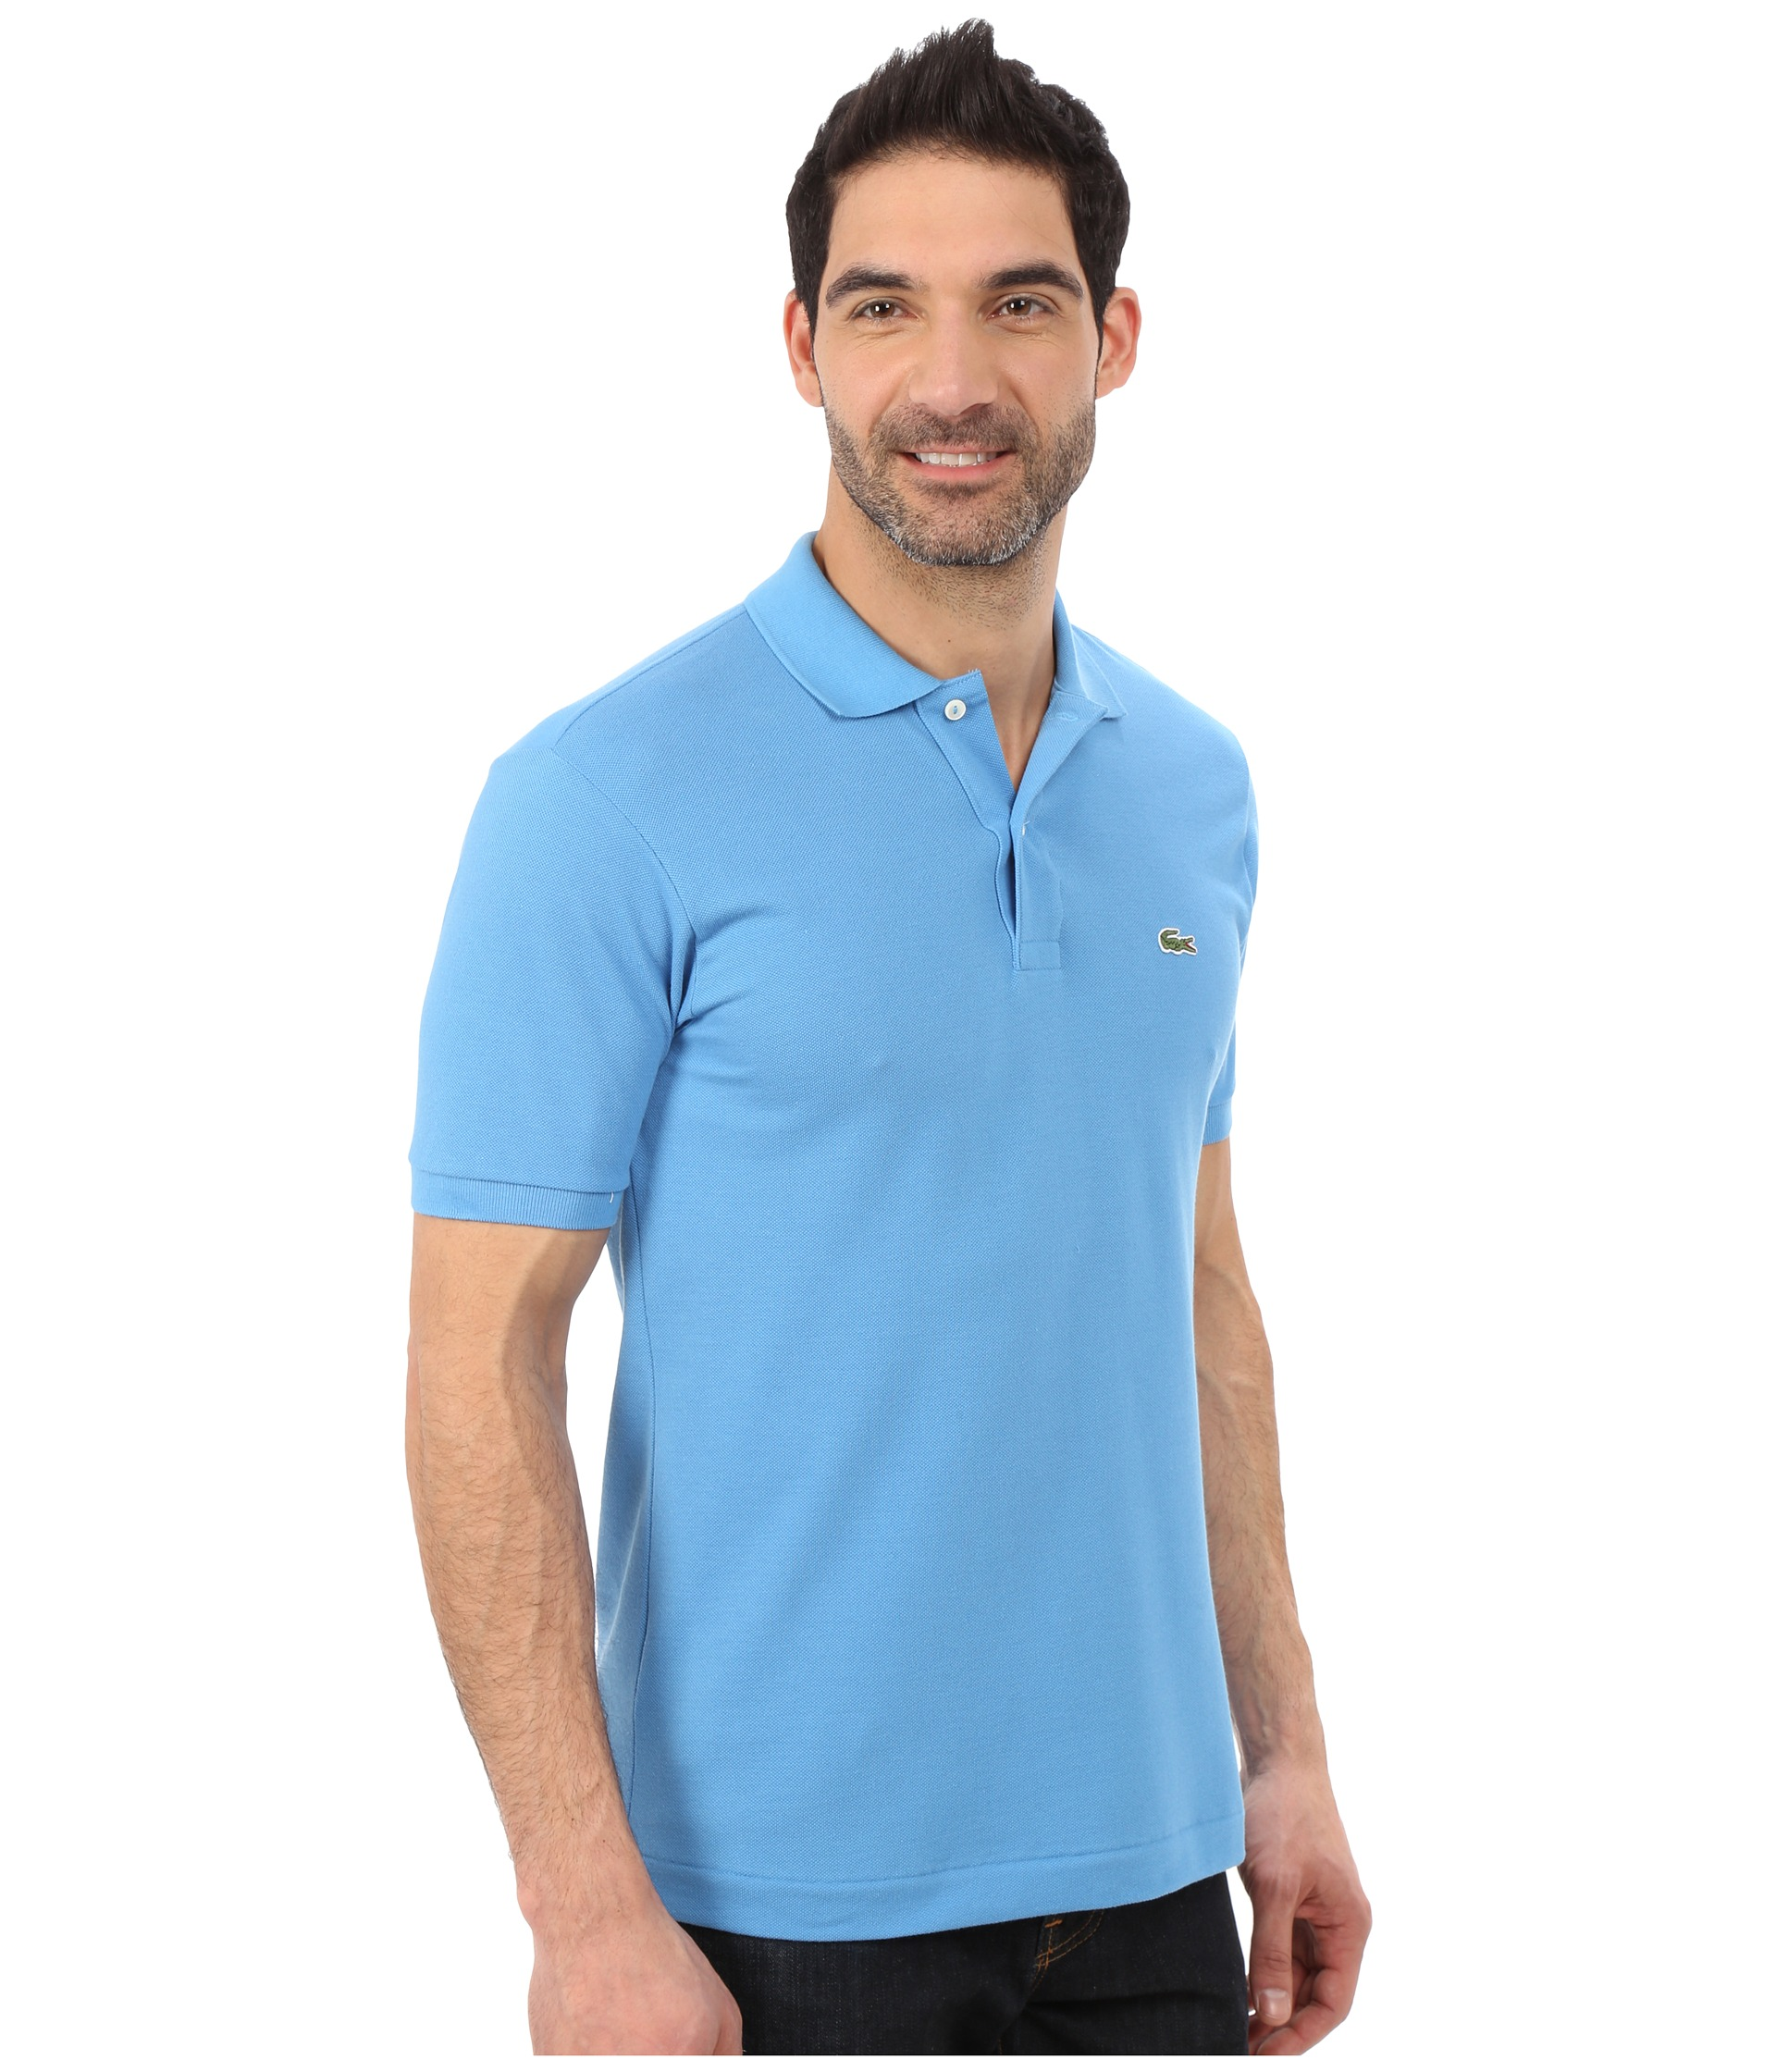 Lacoste l1212 classic pique polo shirt spa blue zappos for Lacoste size 4 polo shirt